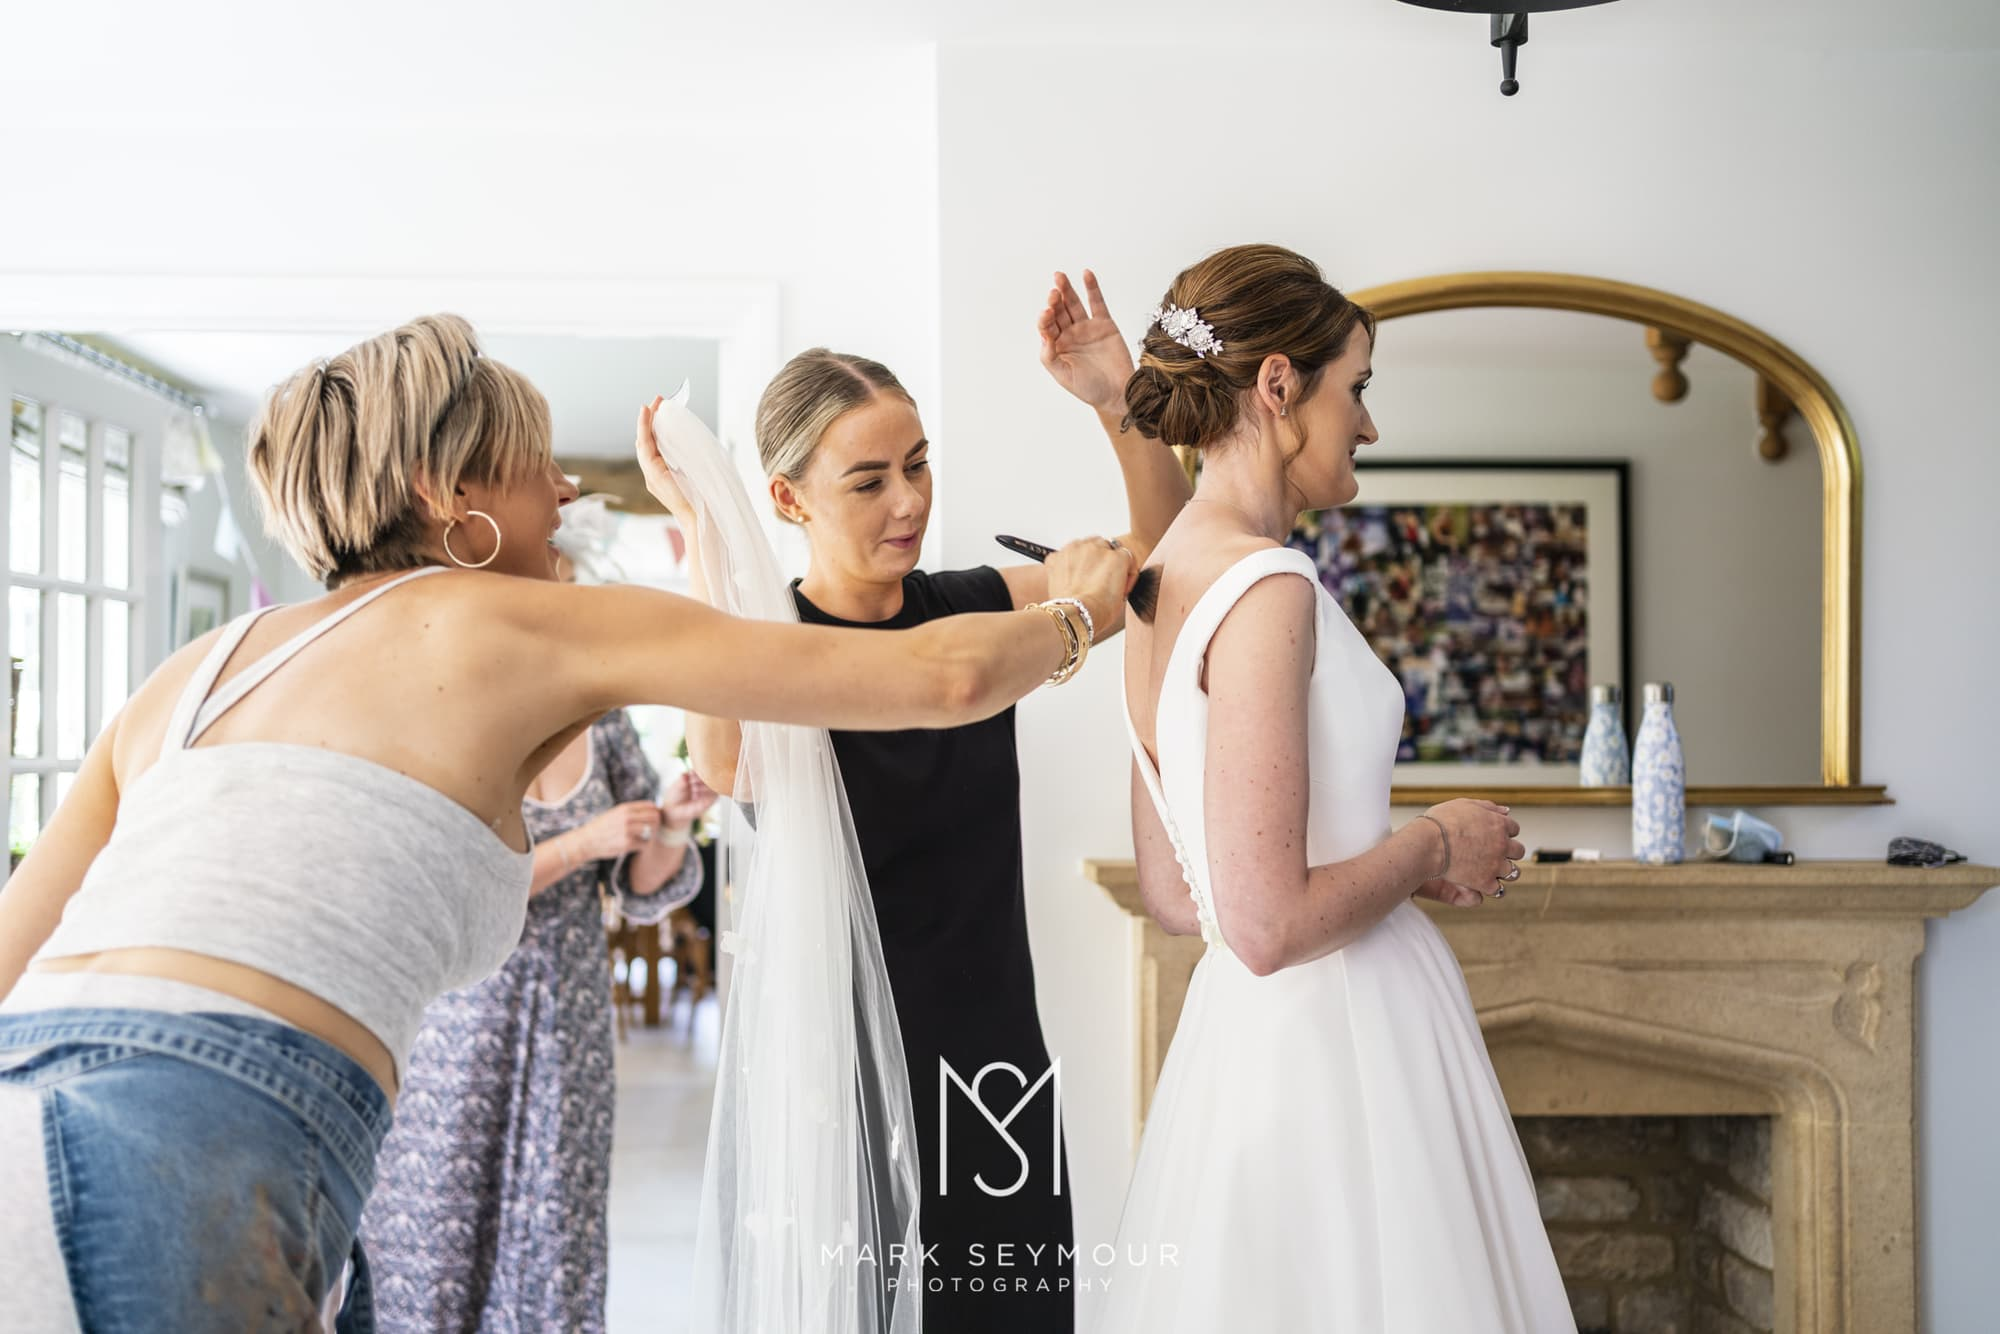 Barnsley House Wedding Photographer - Olivia and James' wedding 2